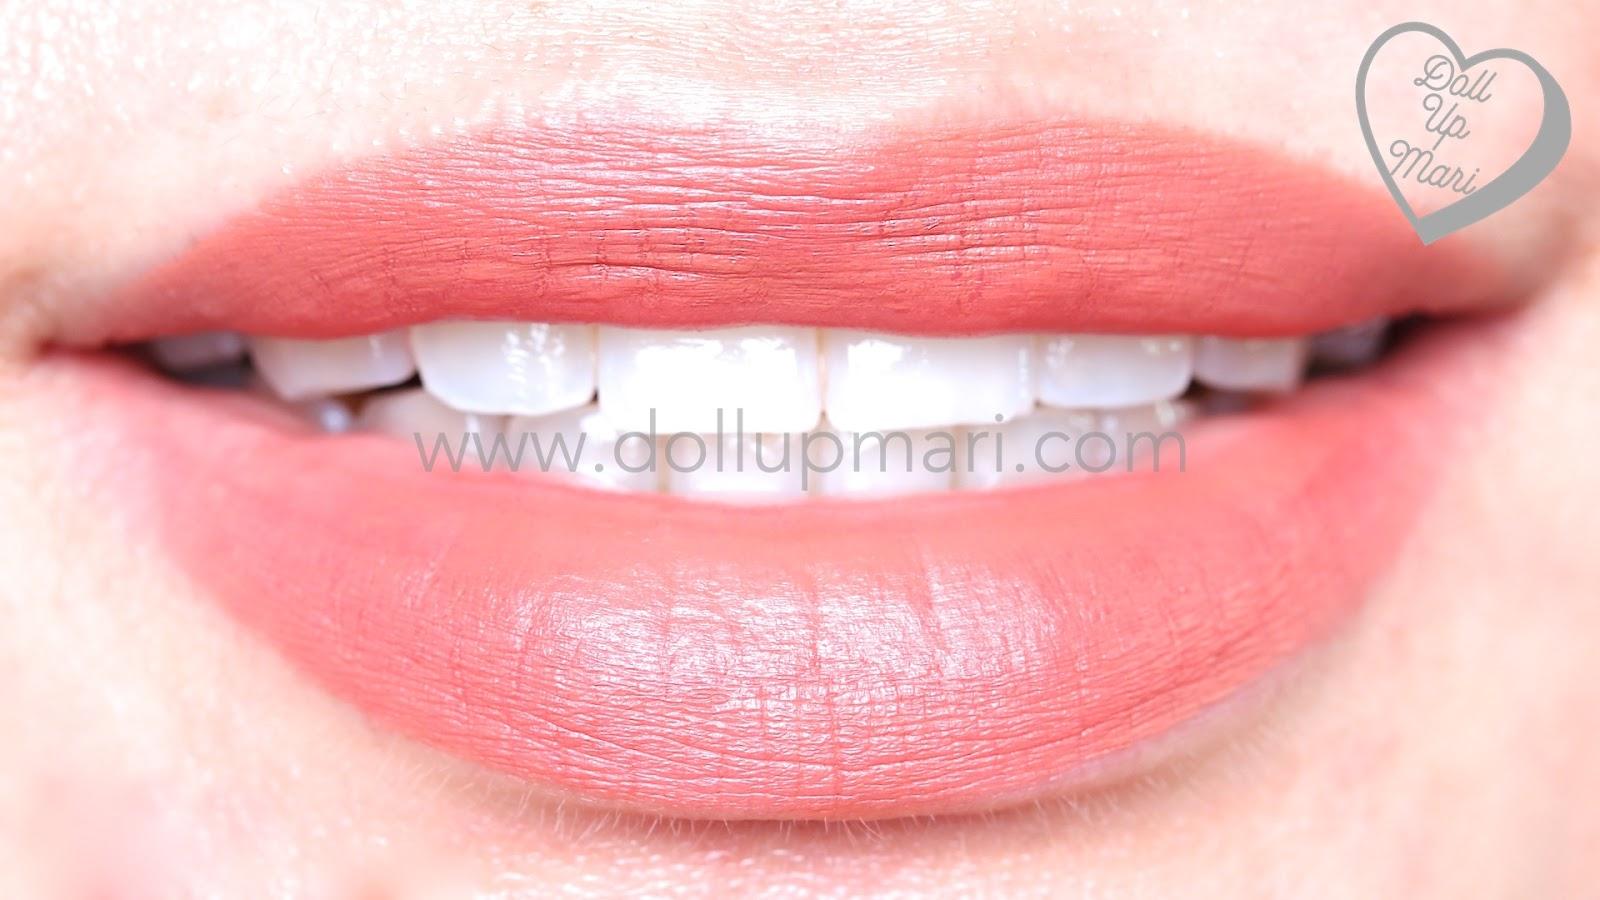 lip swatch of Silkygirl OMG! Powder Matte Lipcolor Lipstick (02-Mocha)